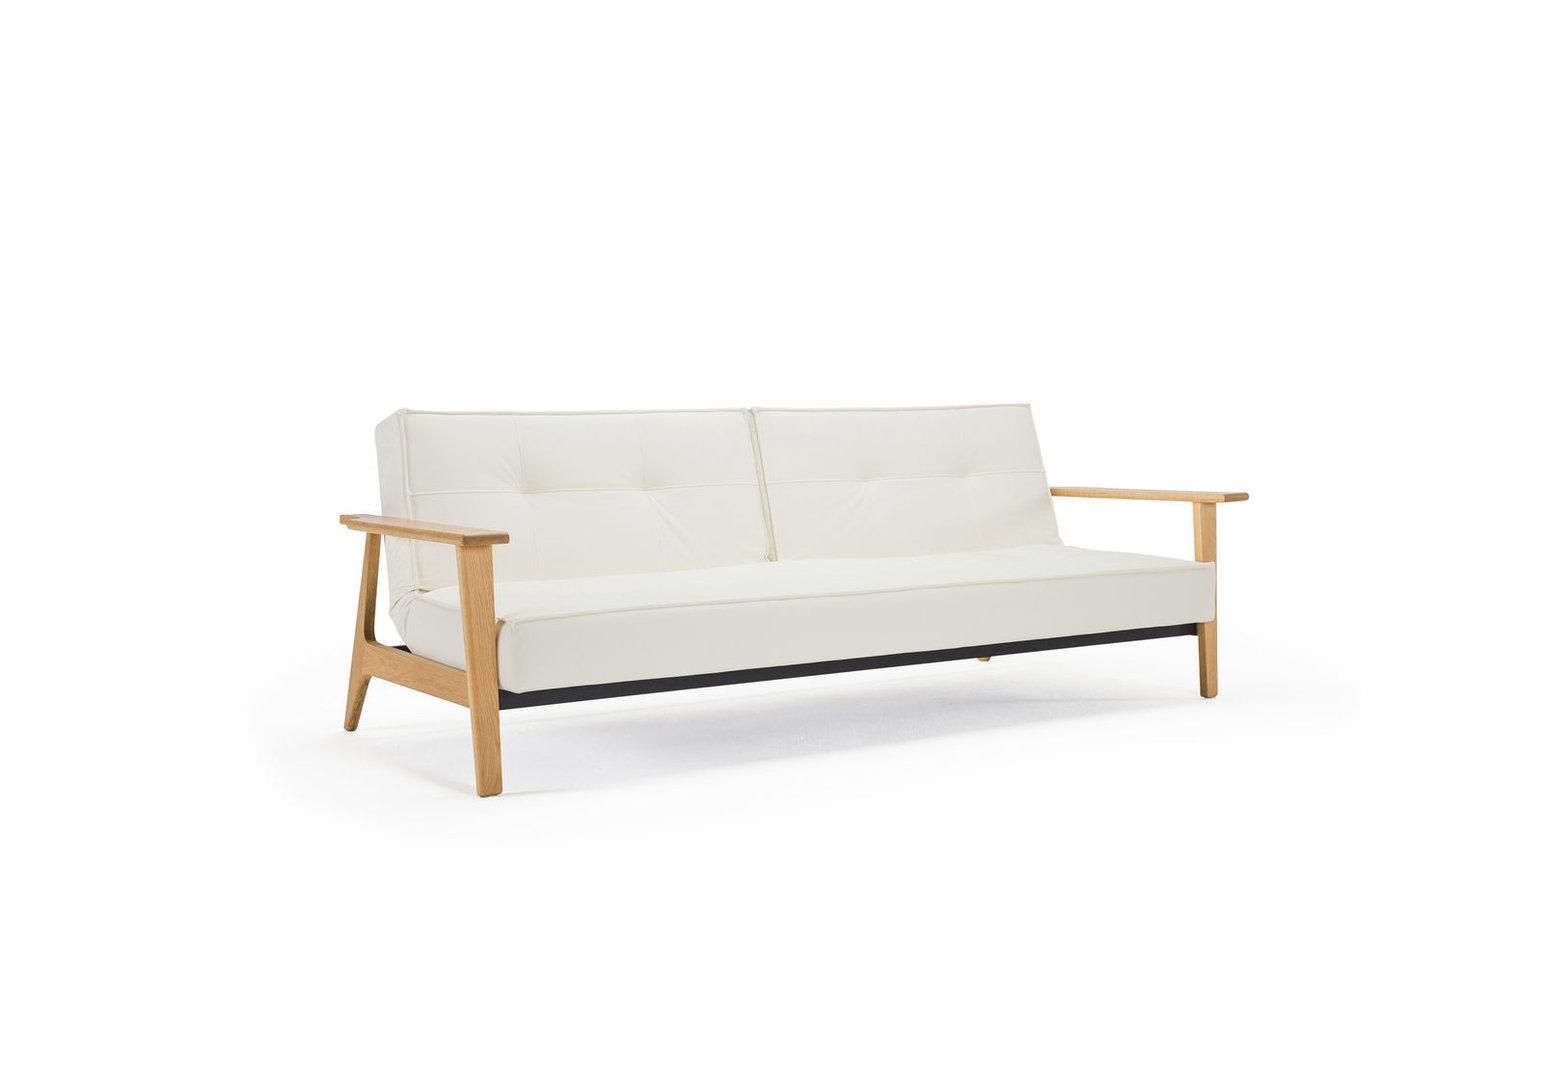 sofa splitback frej von innovation g nstig bestellen buerado. Black Bedroom Furniture Sets. Home Design Ideas